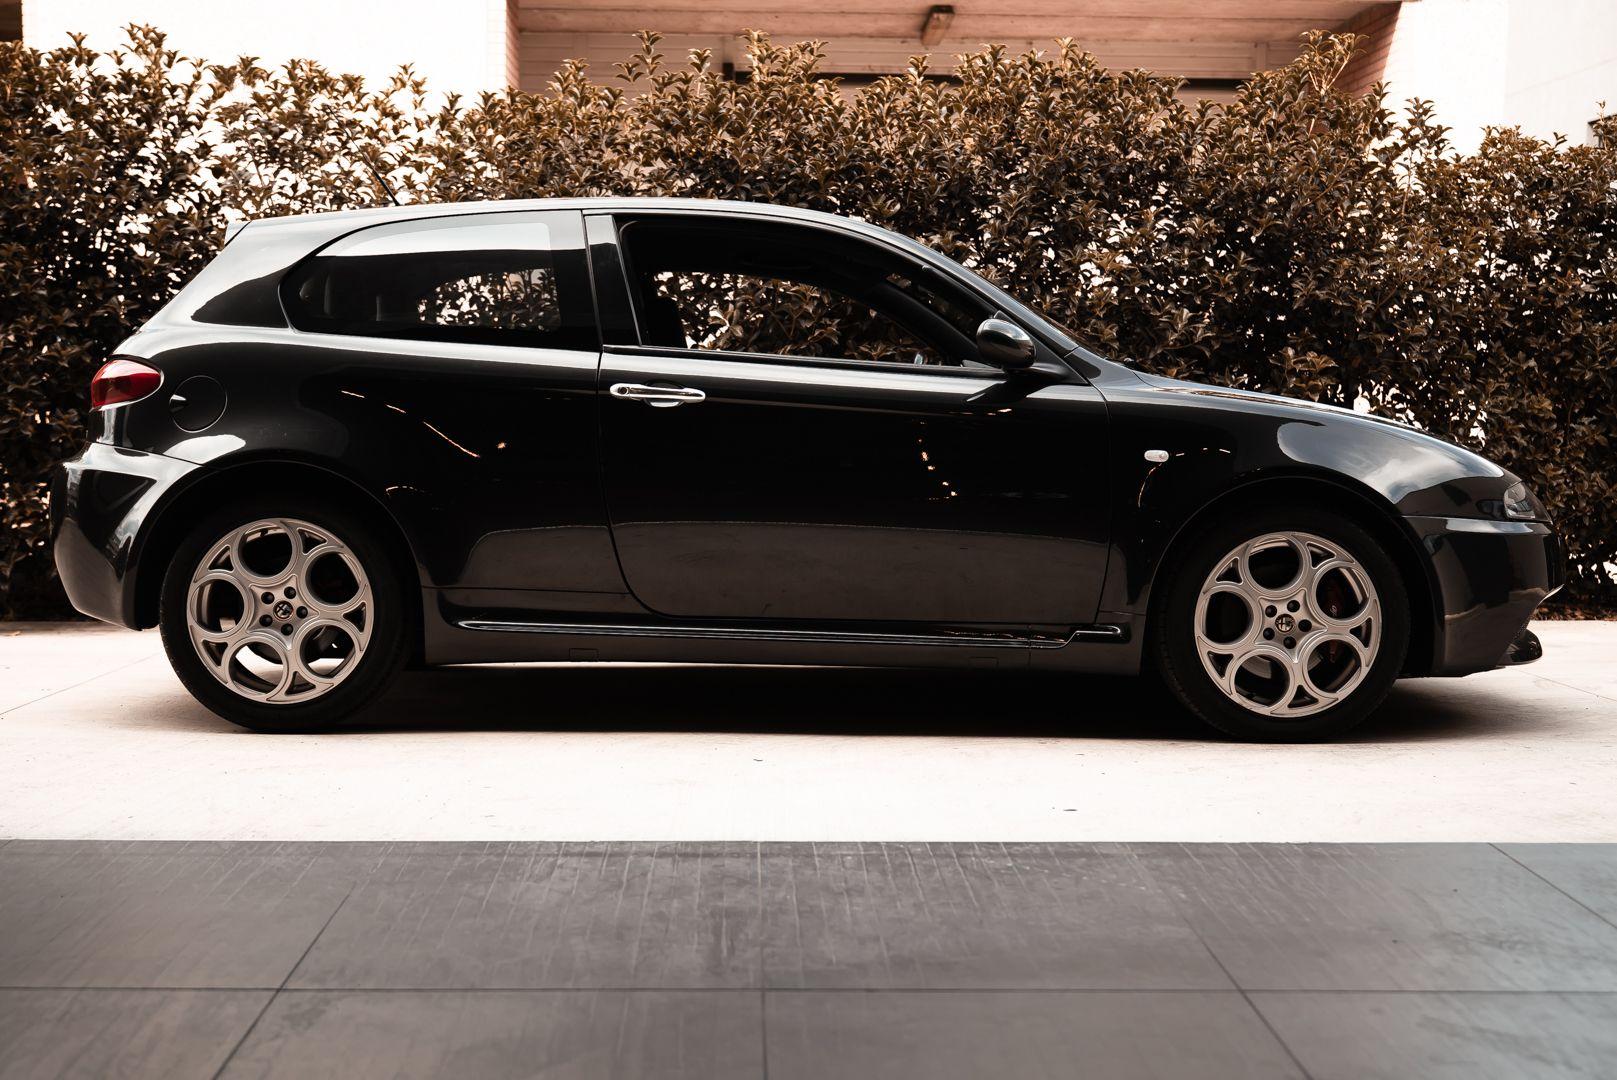 2003 Alfa Romeo 147 GTA 3.2i V6 24V 79573